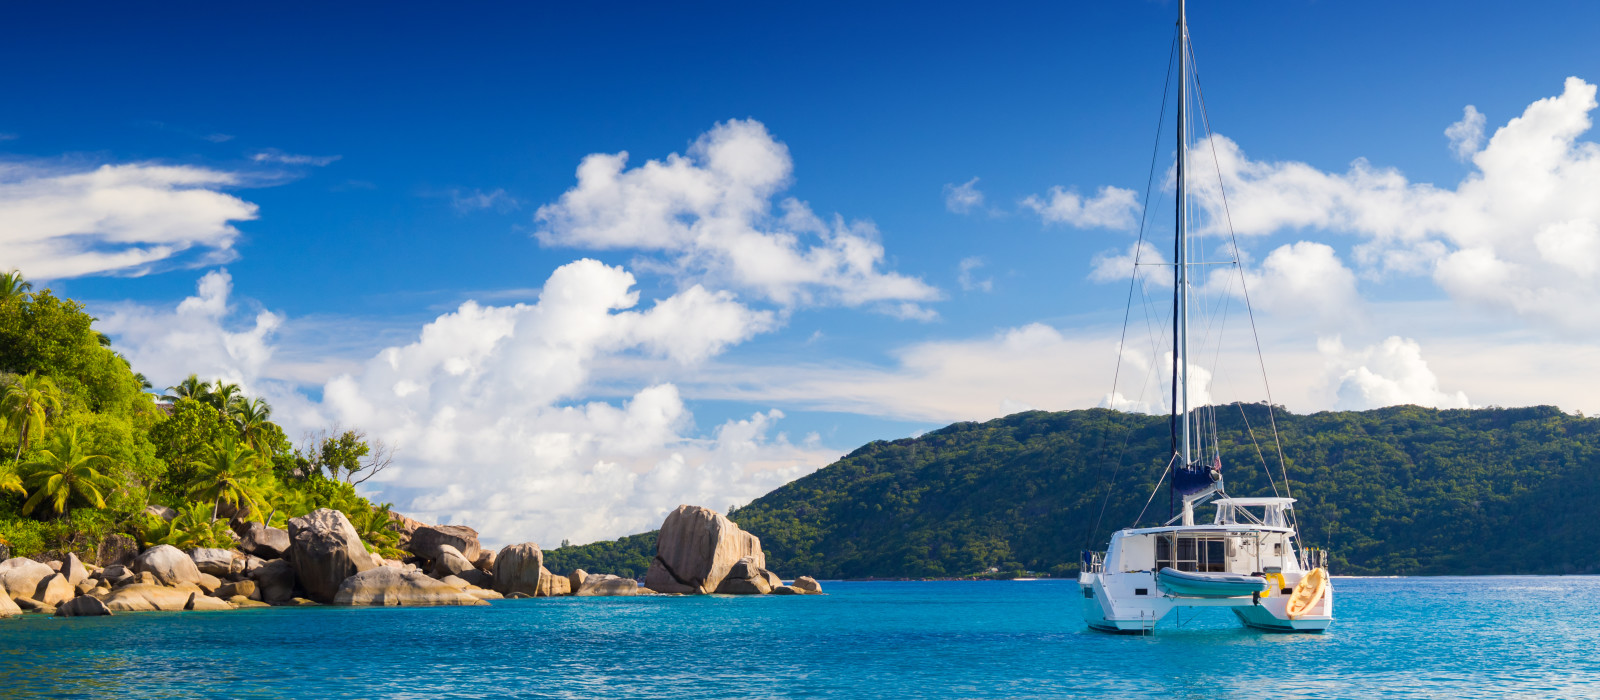 Destination Seychelles Cruise Seychelles